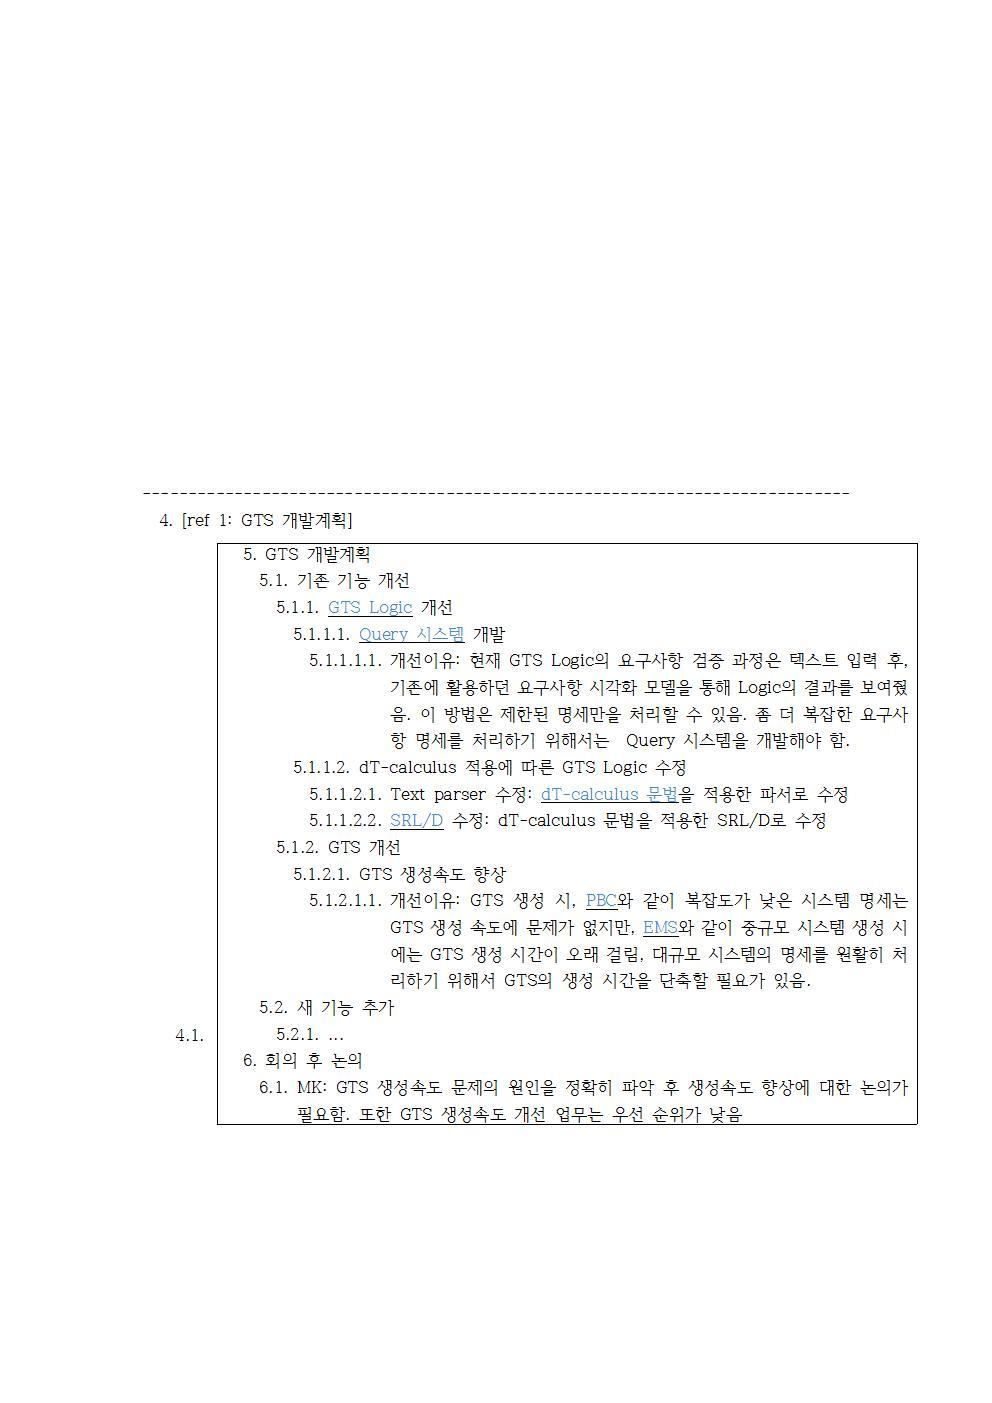 D-[17-005-PP-01]-[SAVE2.0-ADOxx]-[SH]-[2017-12-29]002.jpg